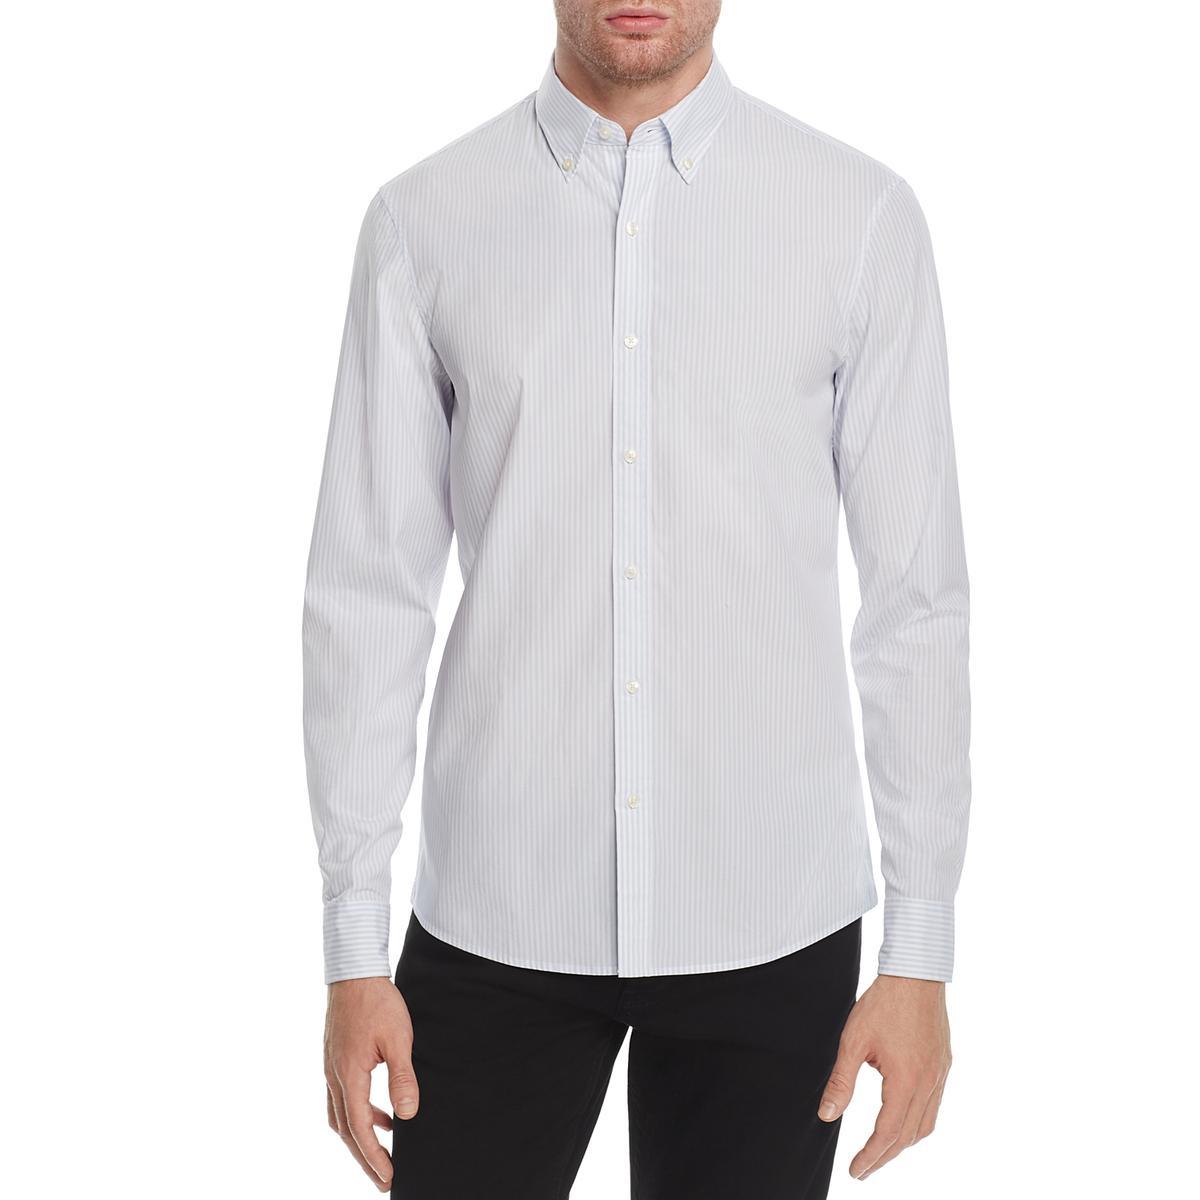 d5d3ec2b2 Details about Michael Kors Mens Blue Striped Long Sleeves Button-Down Shirt  Top L BHFO 7930